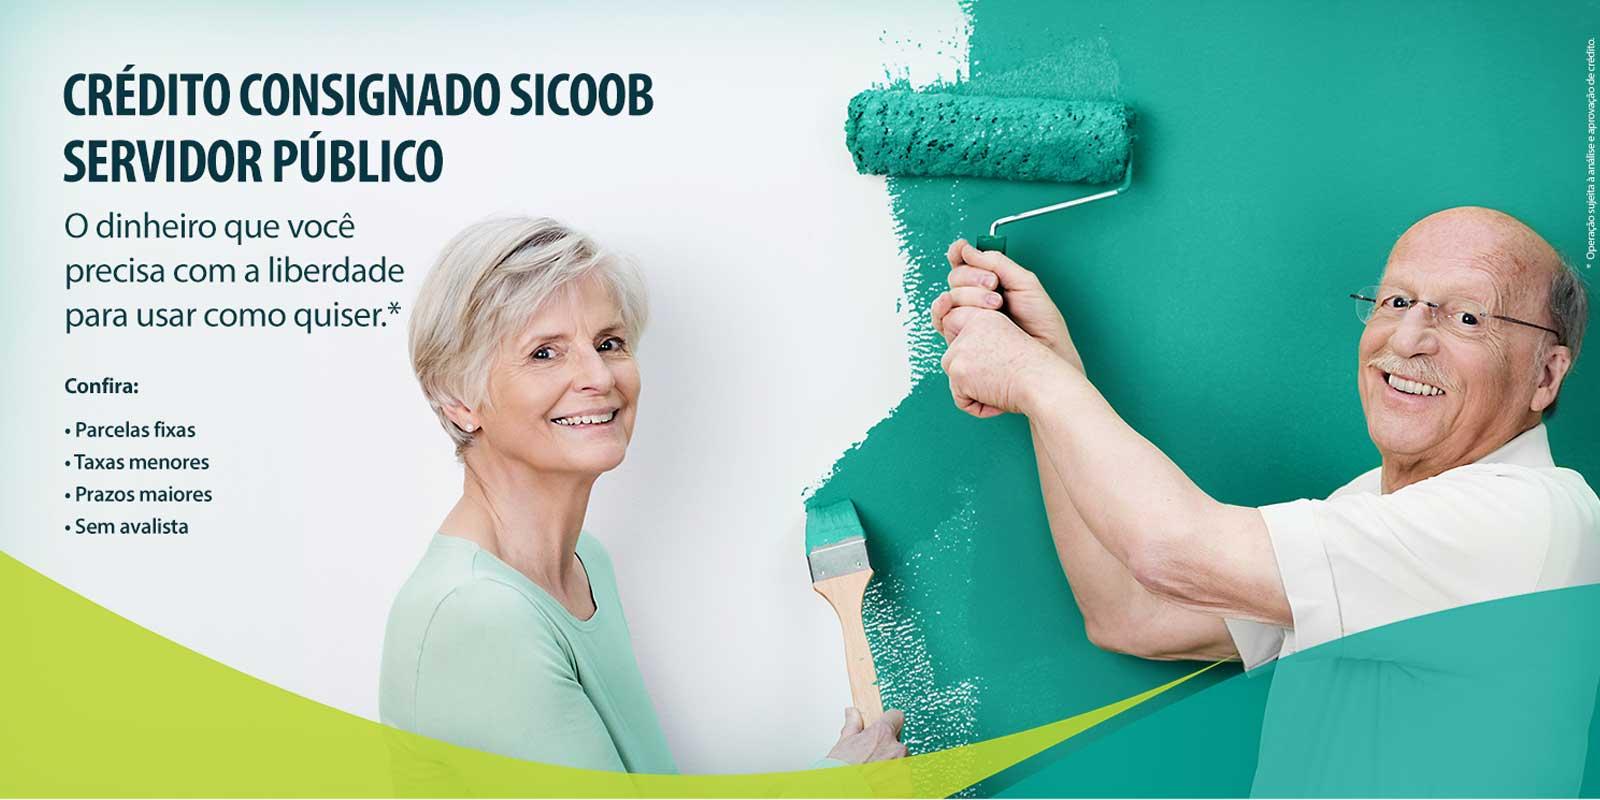 Empréstimo Sicoob para aposentados